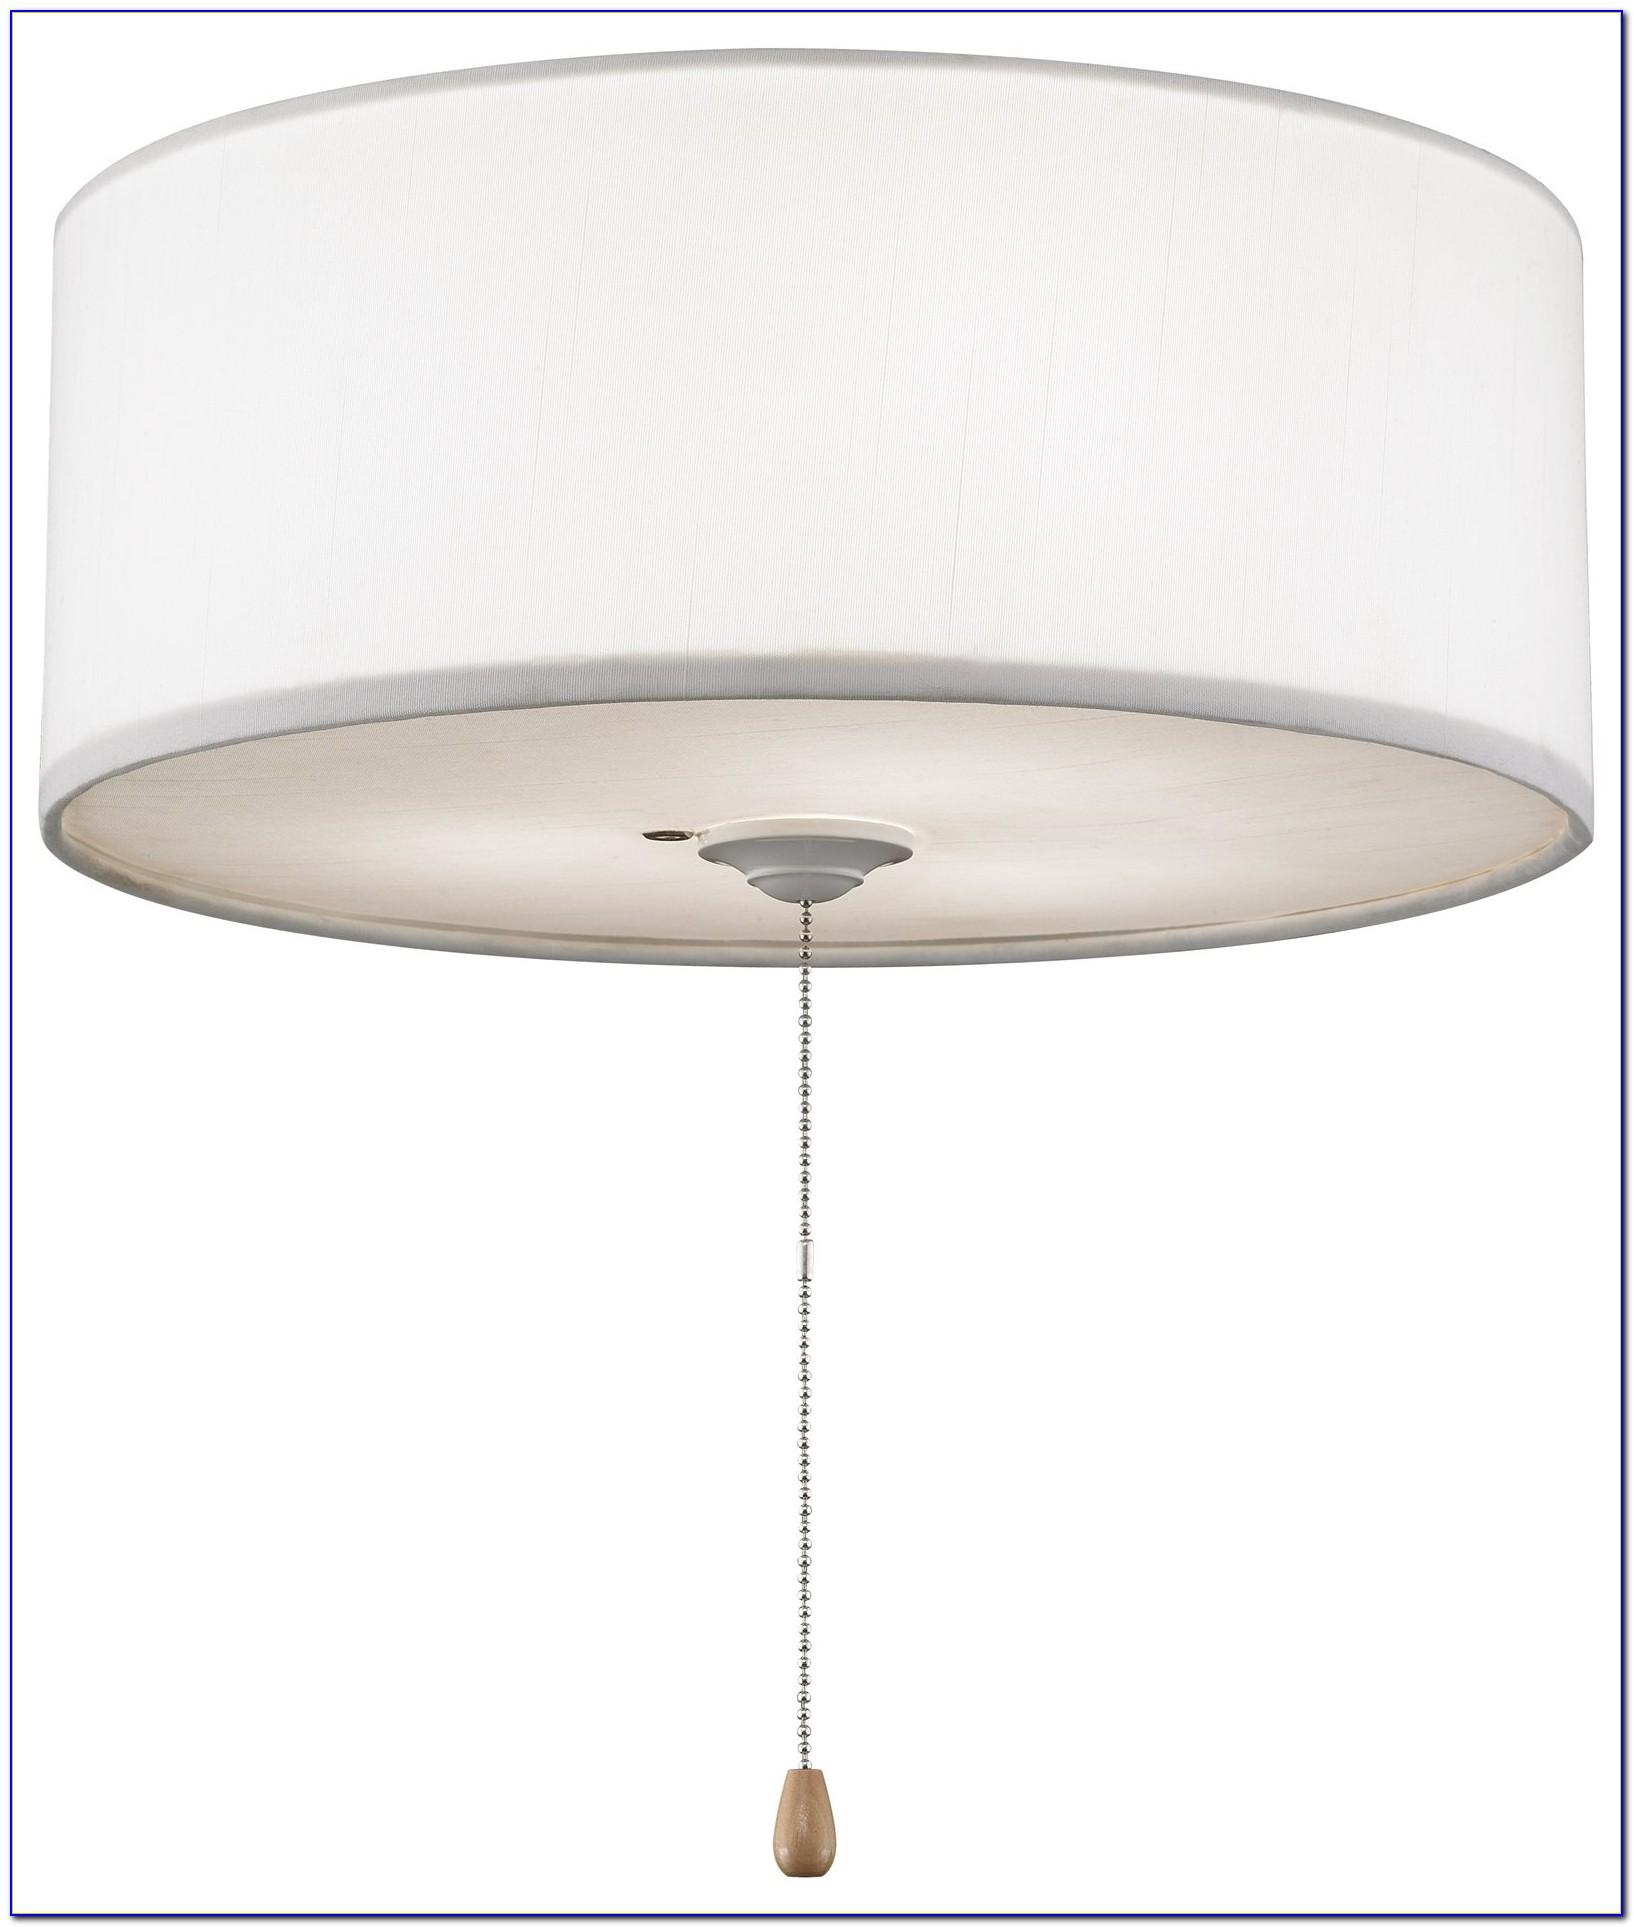 Lamp Shade On Ceiling Fan